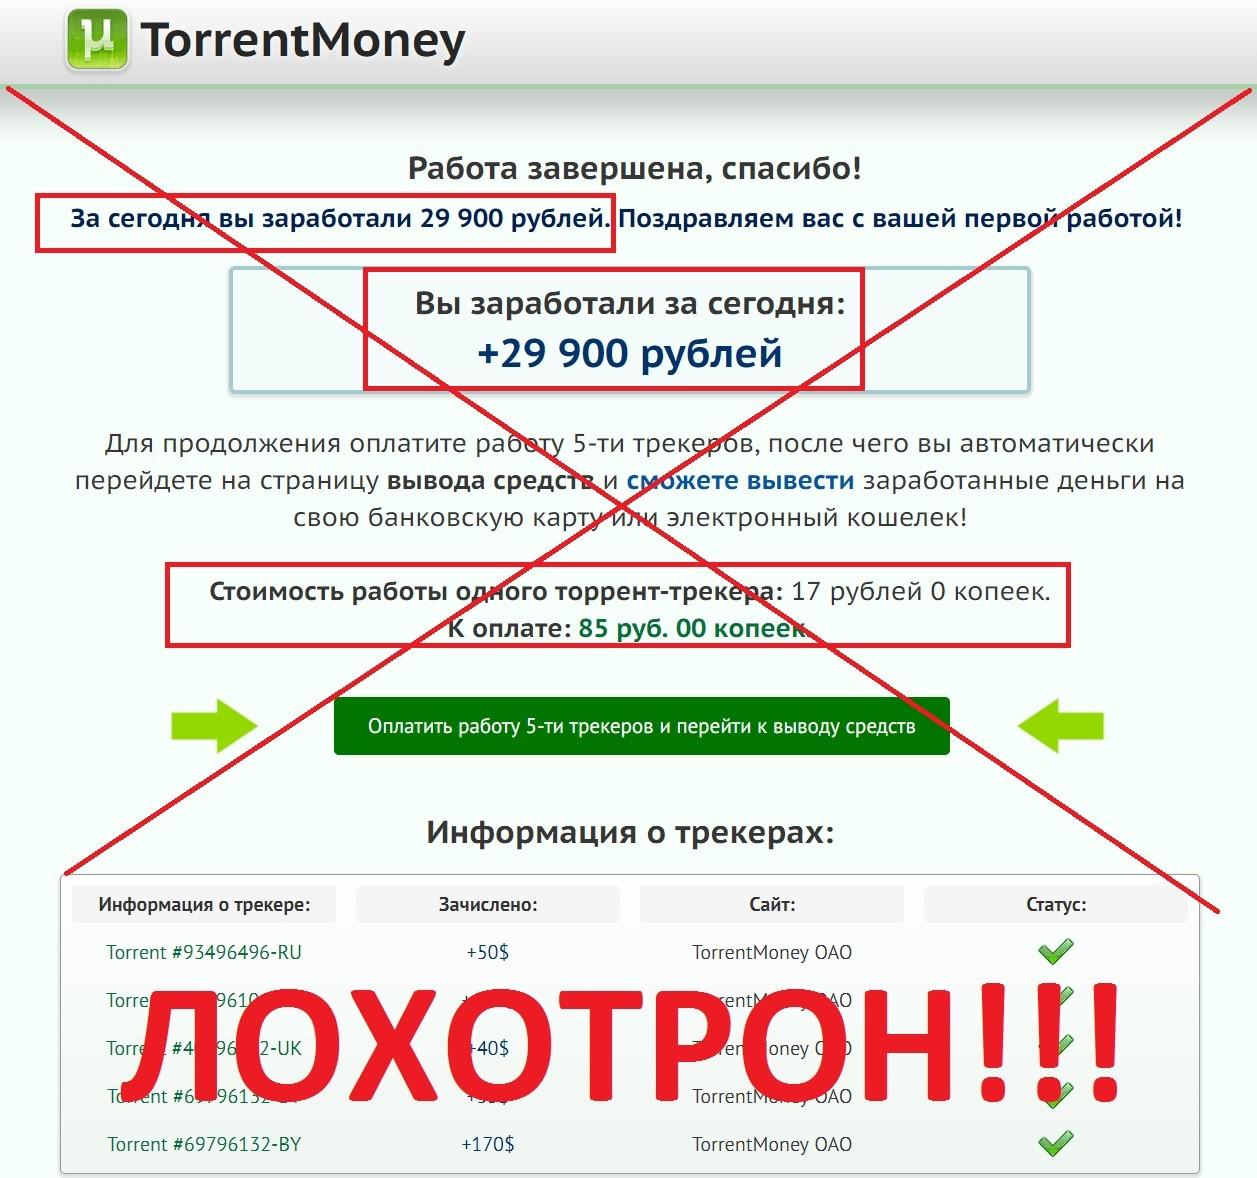 Обман в интернете, мошенники